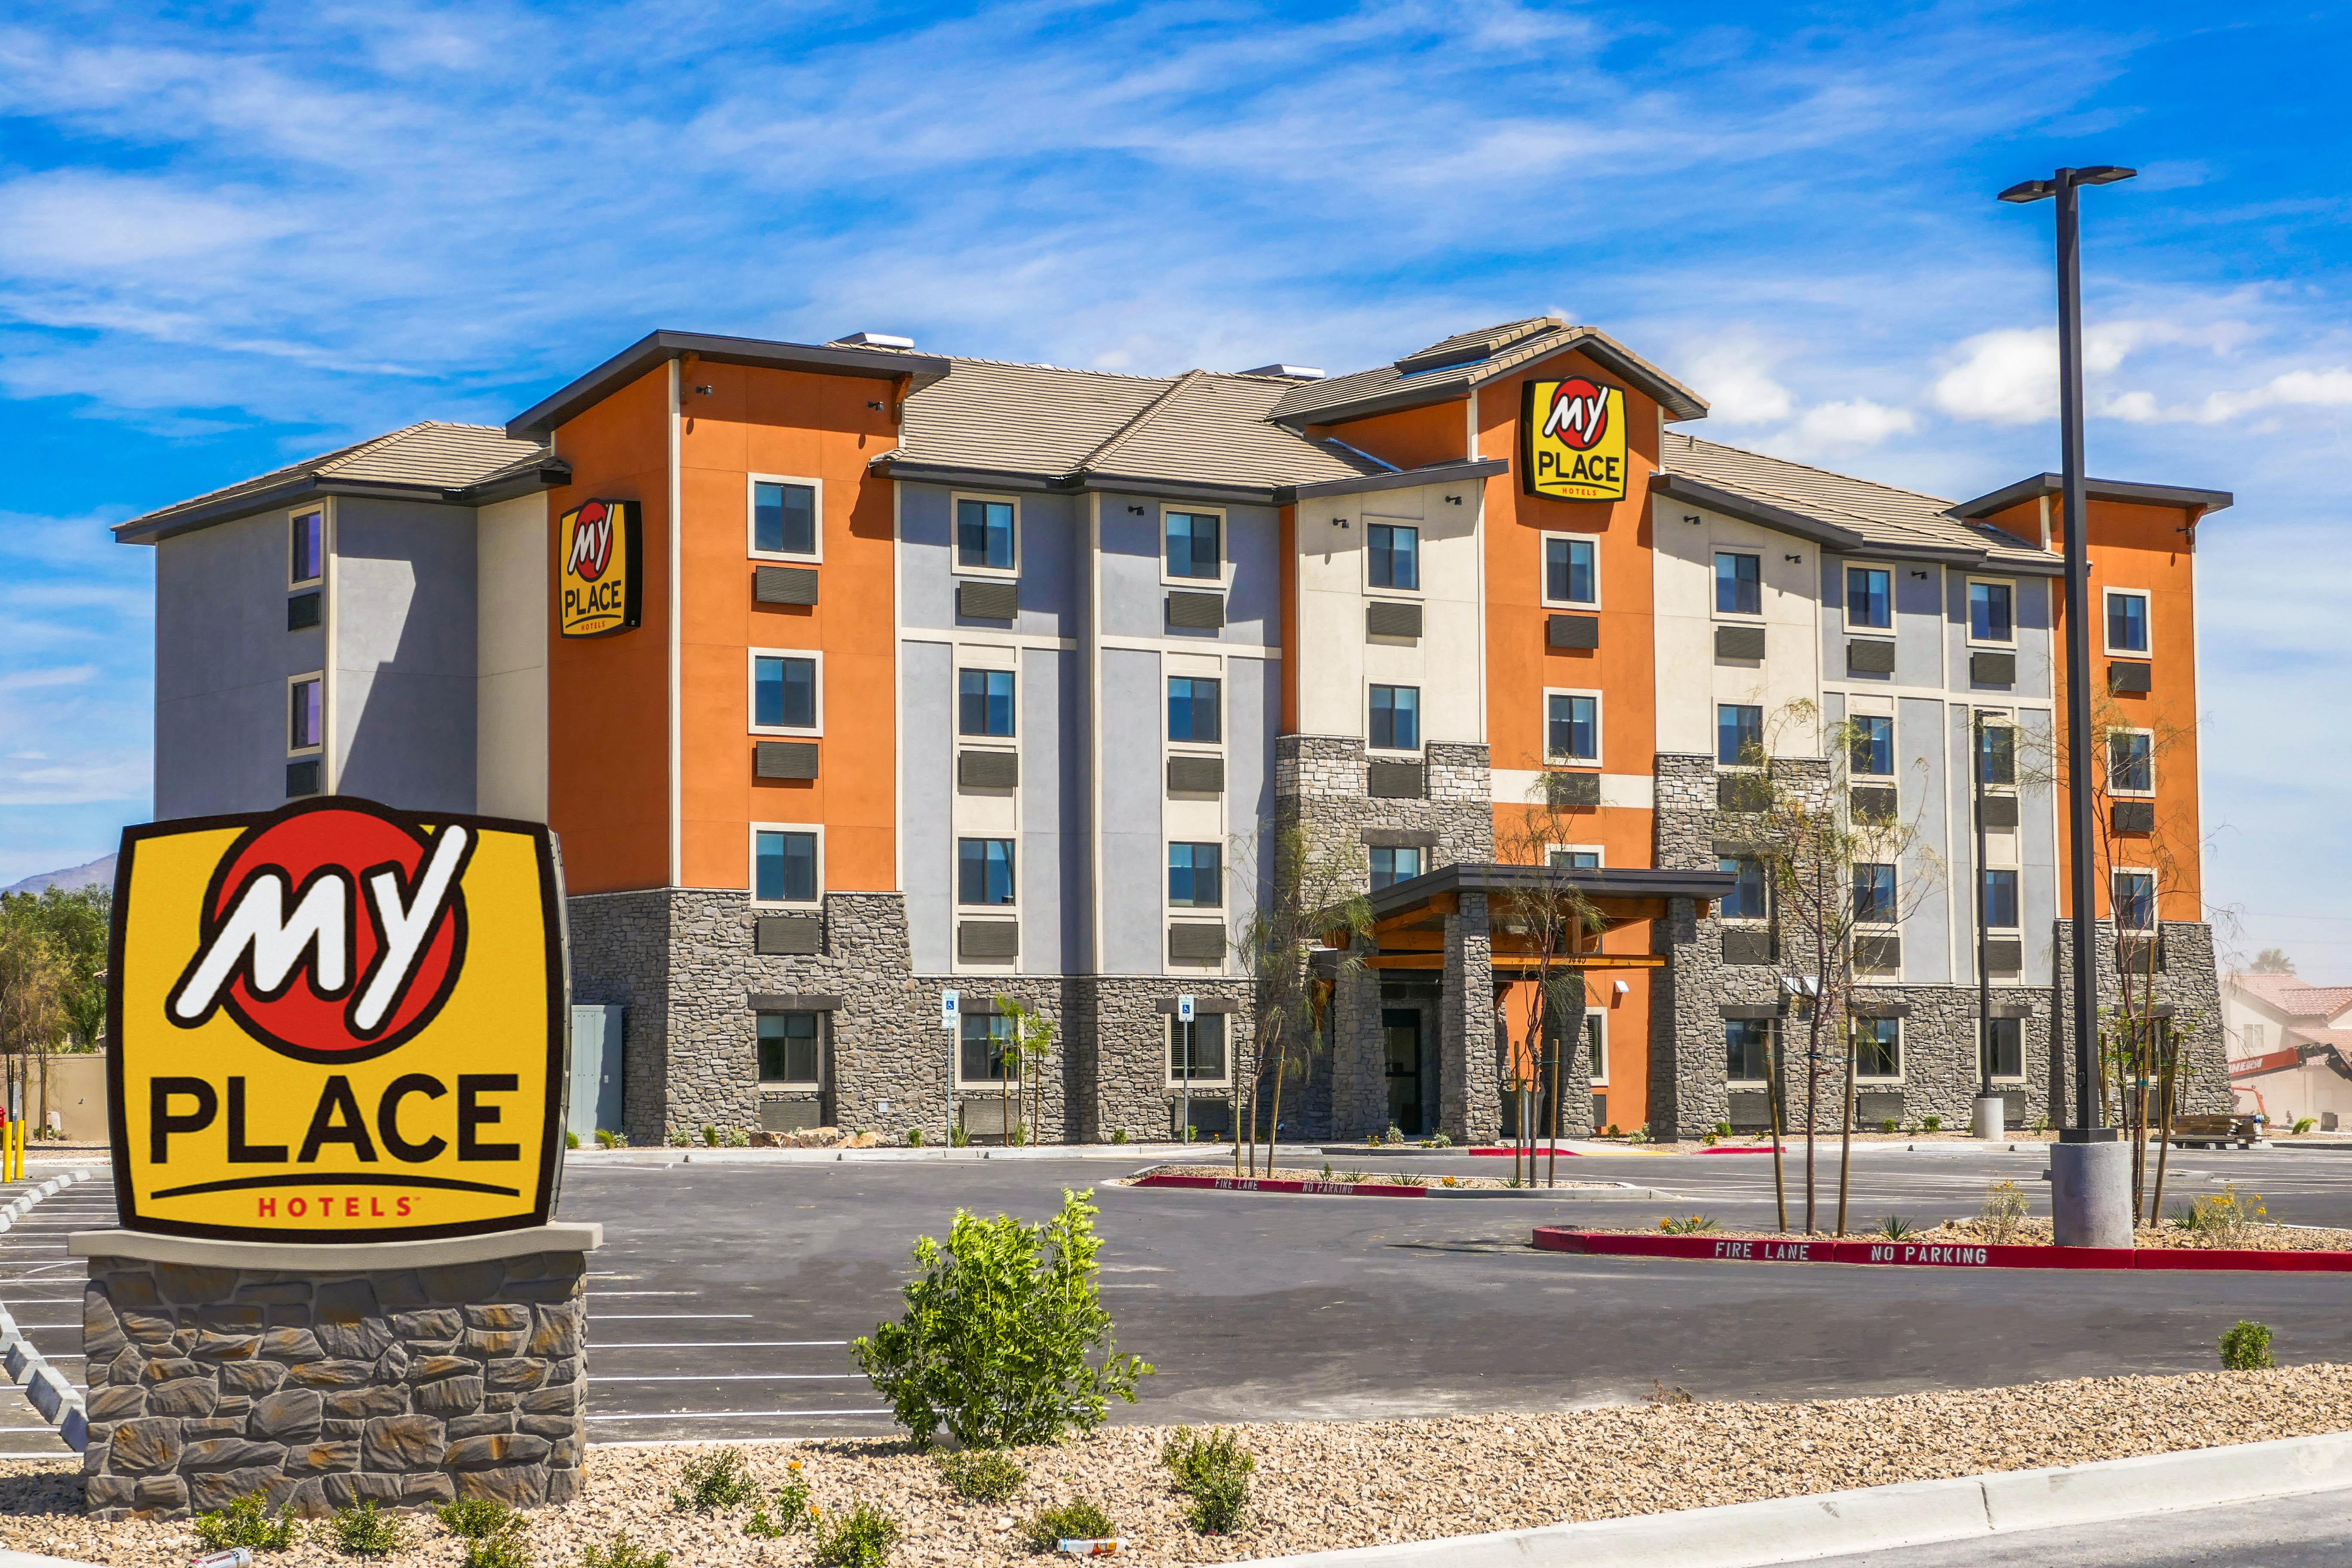 My Place Hotel-n Las Vegas Nv